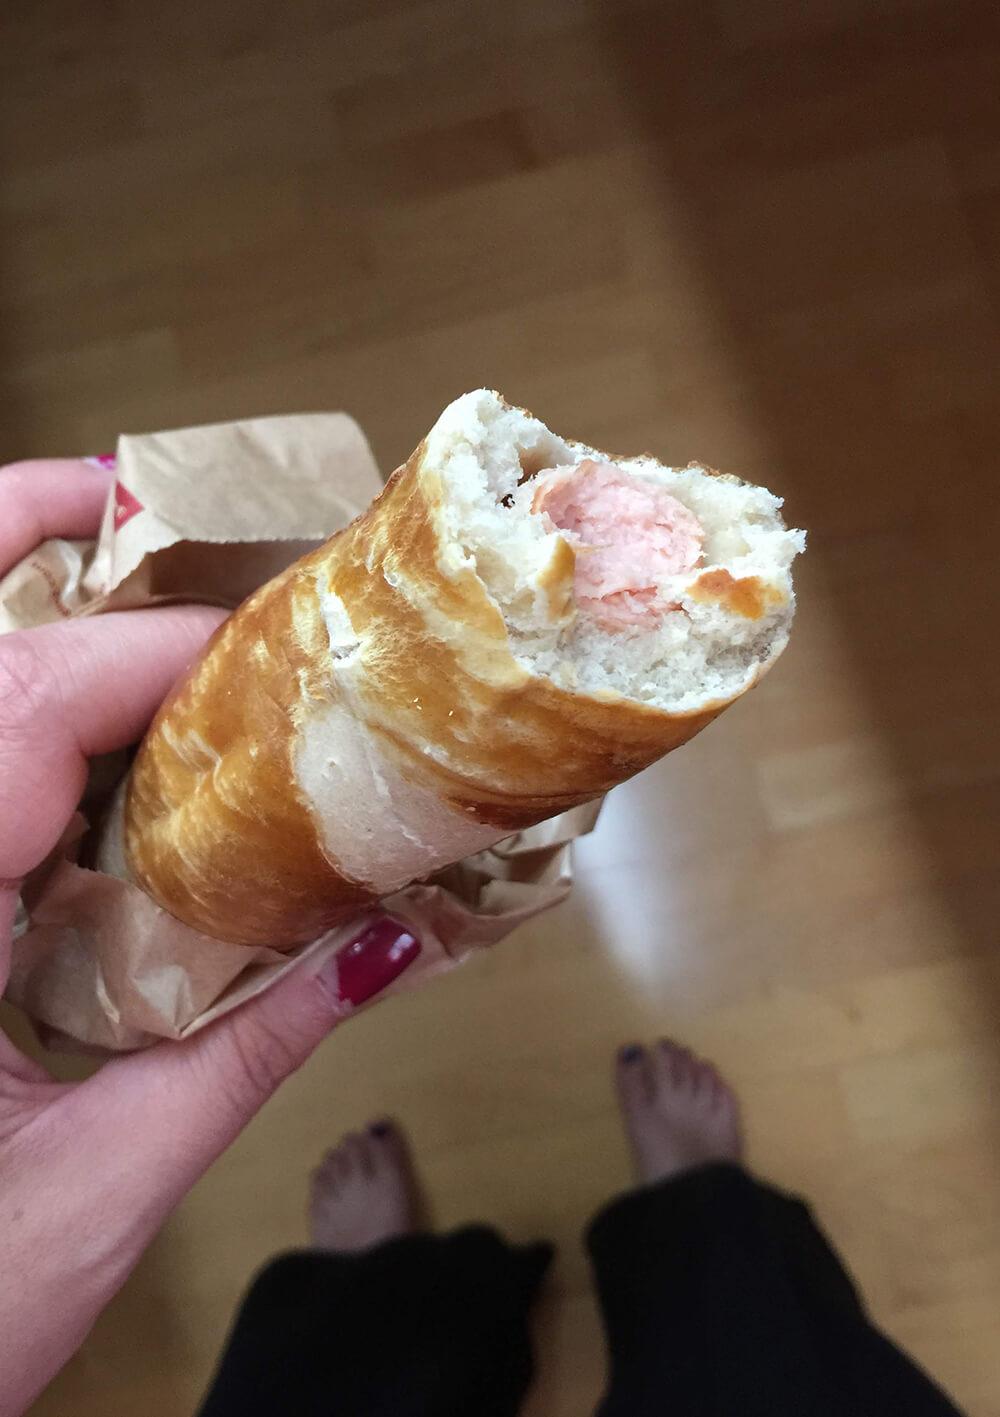 Neuburger Delikatesse: Wienerl im Brezenteig